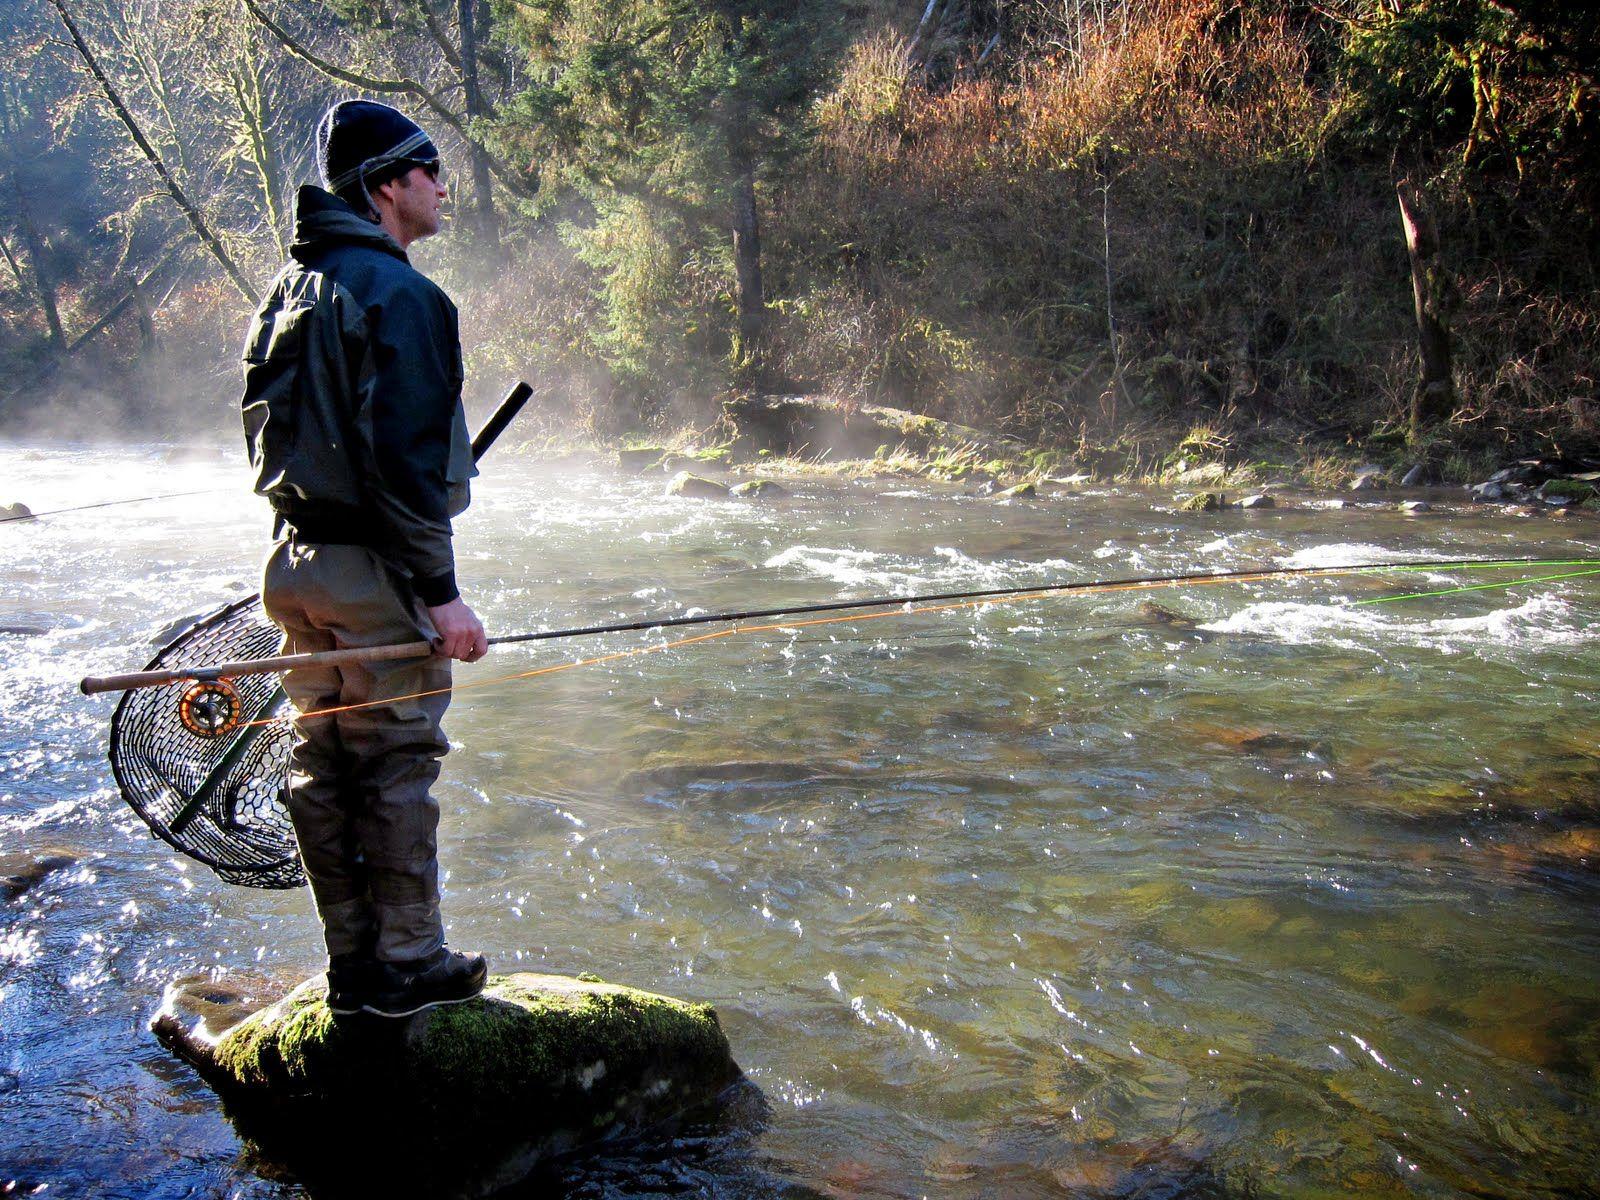 Nehalem River Oregon Fly Fishing Gone Fishing Fly Fishing Kit